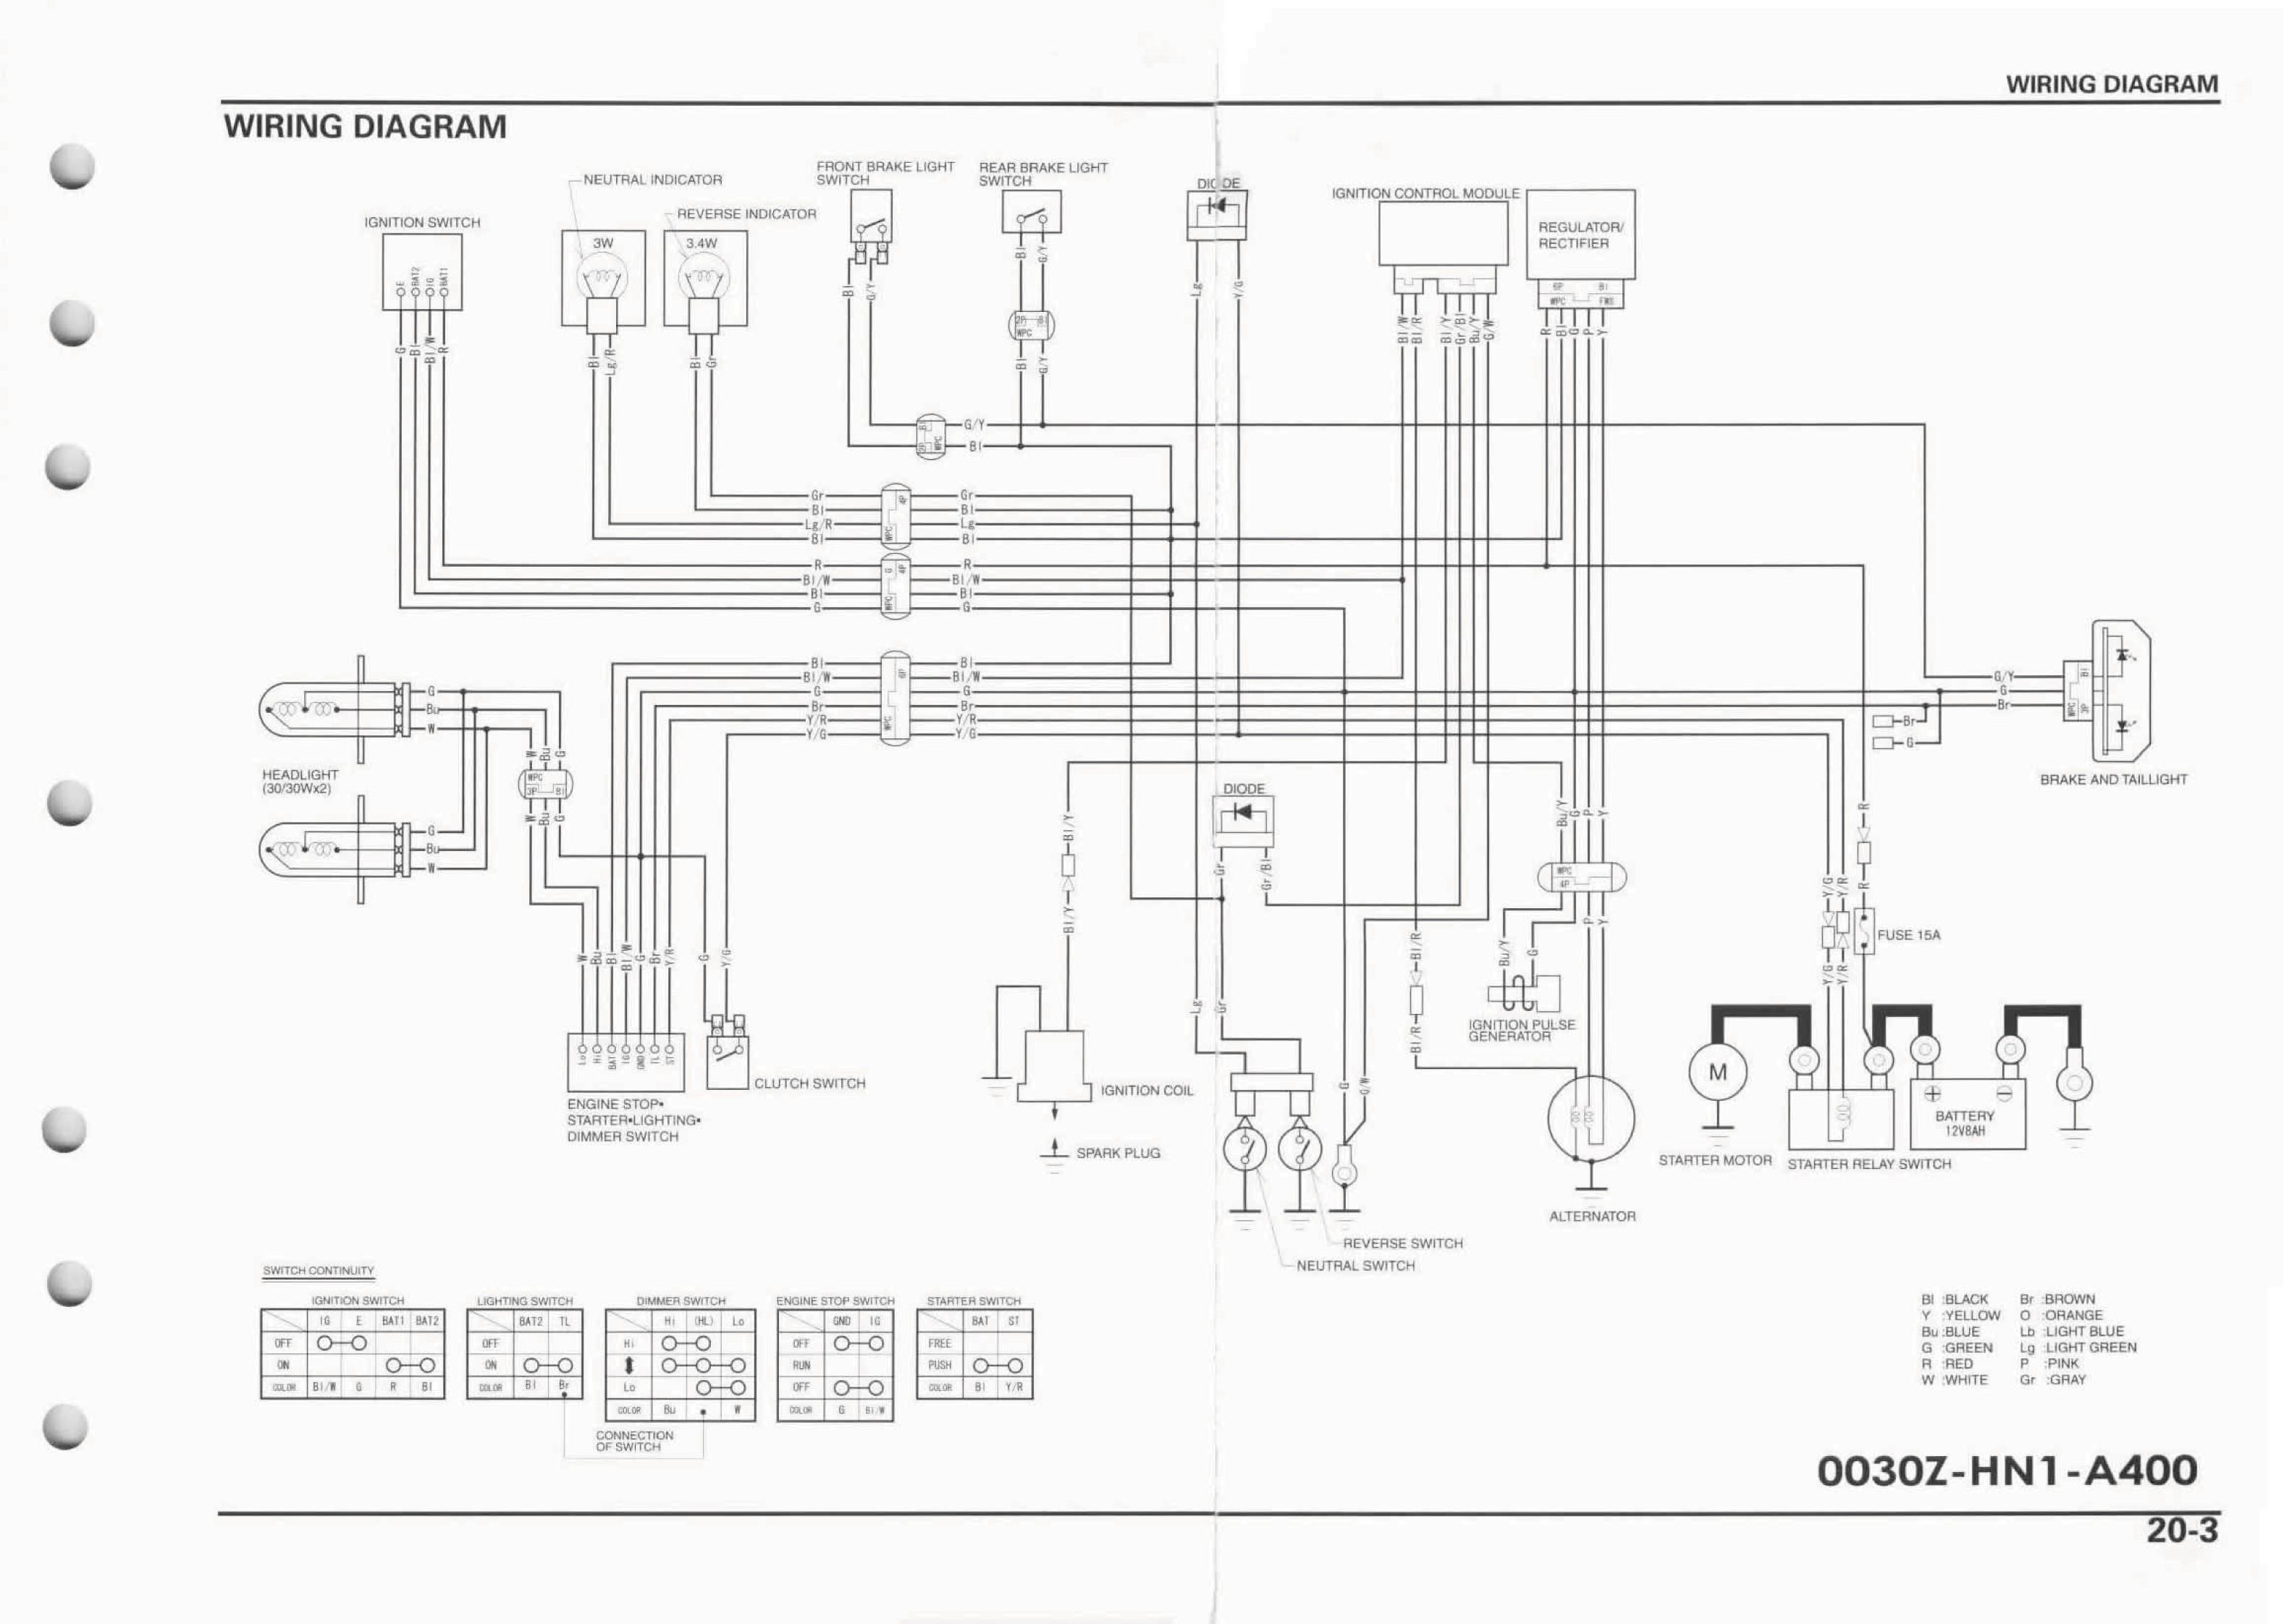 Ds 90 Wiring Diagram - Warm Air Furnace Wiring -  bobcate-s70.losdol2-blong.jeanjaures37.fr | Ds 90 Wiring Diagram |  | Wiring Diagram Resource